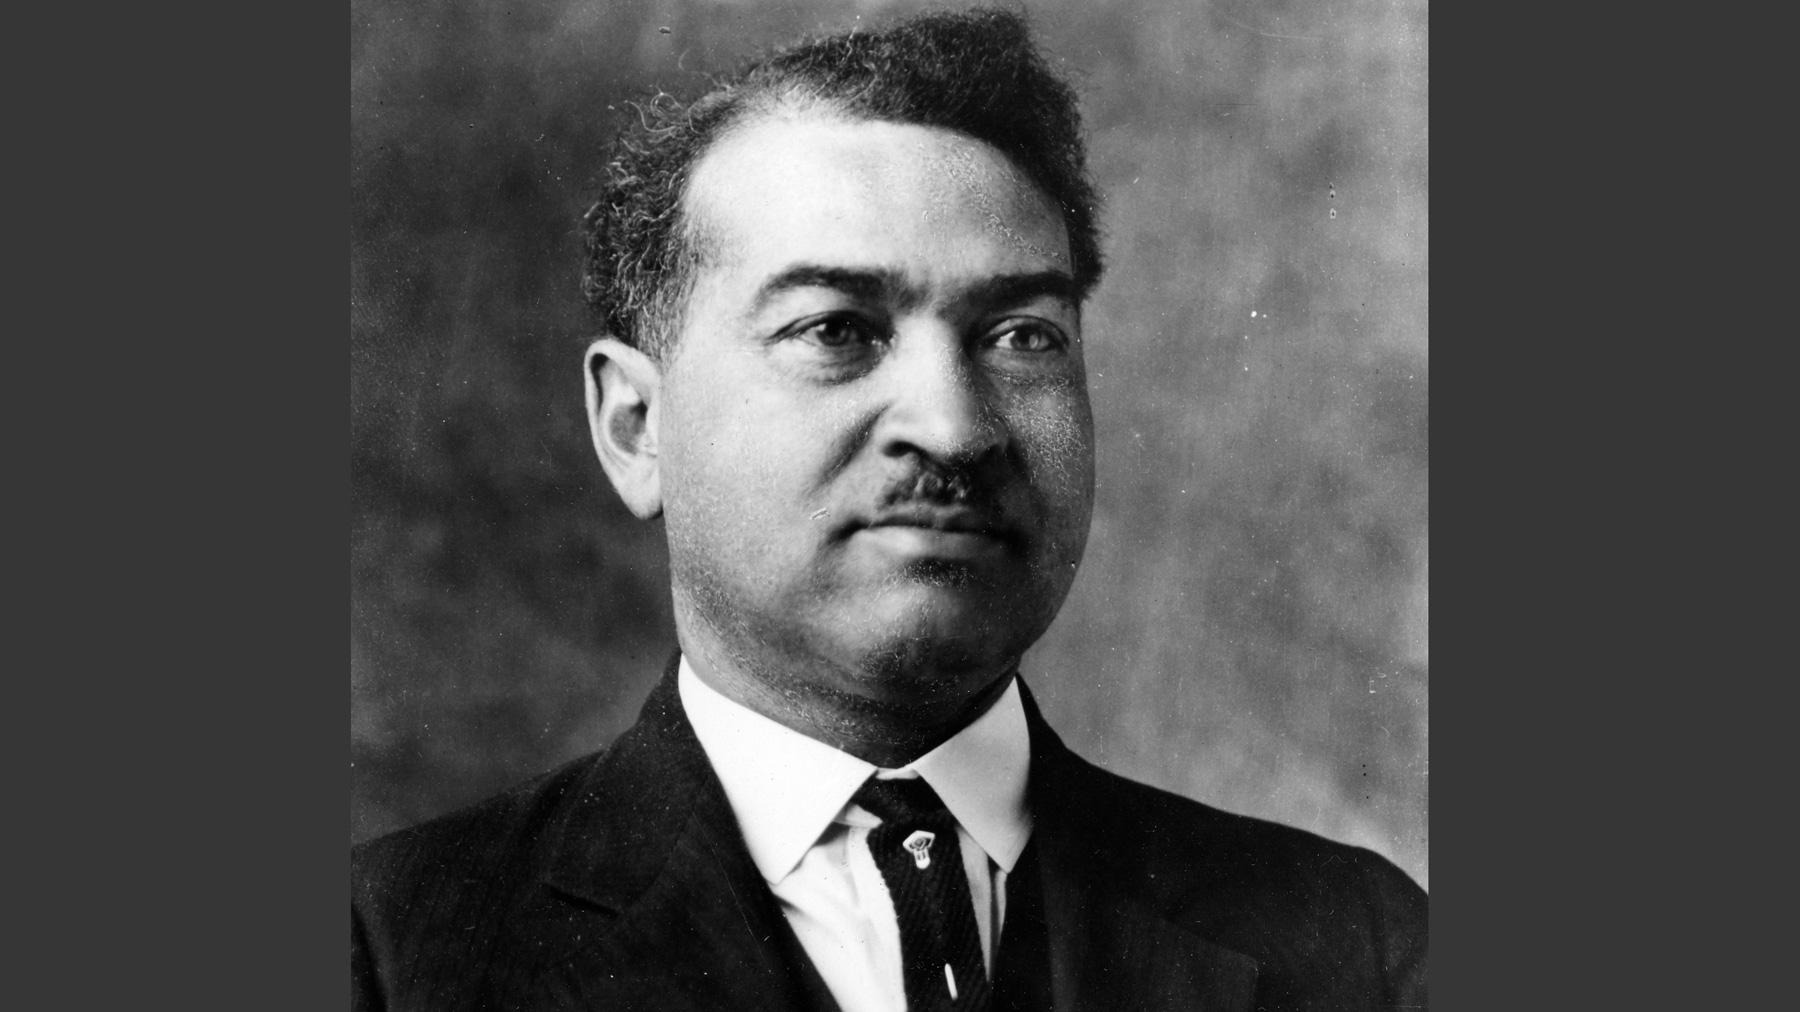 Albert Lee, courtesy of the University of Illinois Archives